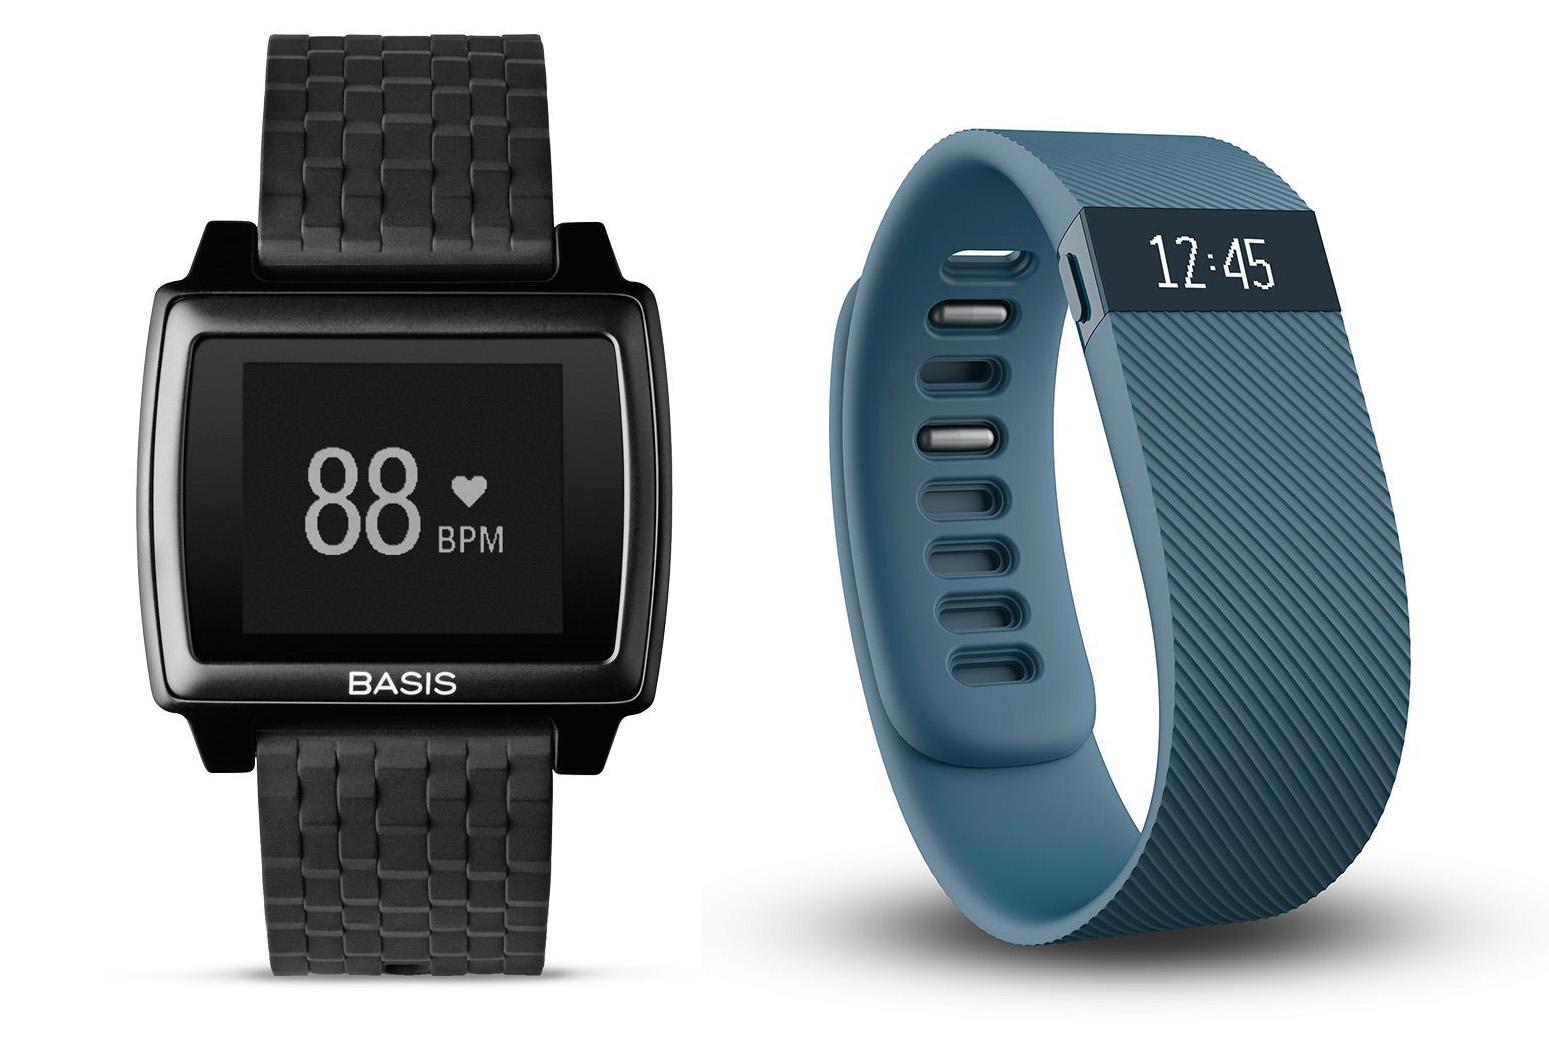 Fitness Tracker Comparison, fitbit, basis, fitbit competitors, fitbit comparison, Fitbit vs Basis, basis peak